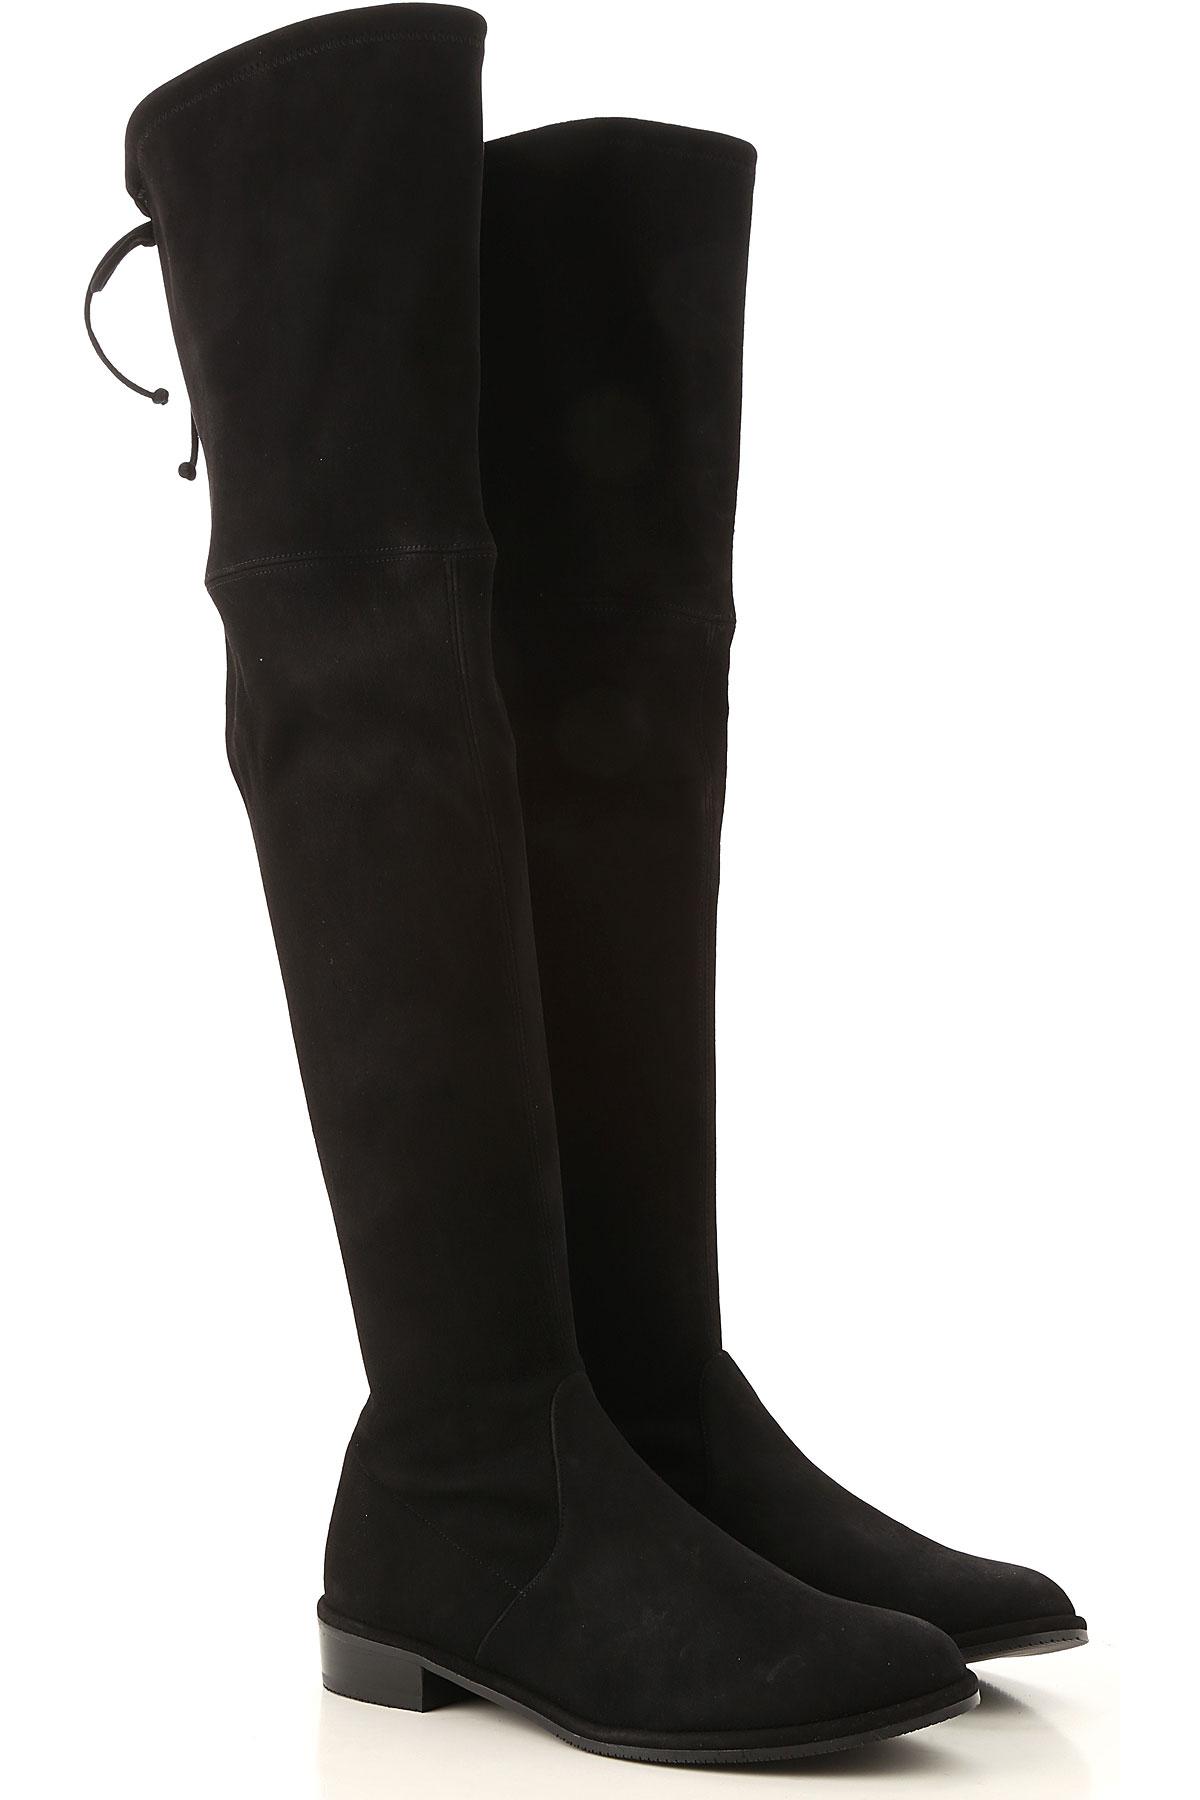 Stuart Weitzman Boots for Women, Booties On Sale, Black, Suede leather, 2019, US 4.5 ( EU 35) US 5.5 (EU 36) US 6.5 (EU 37) US 9.5 (EU 40)